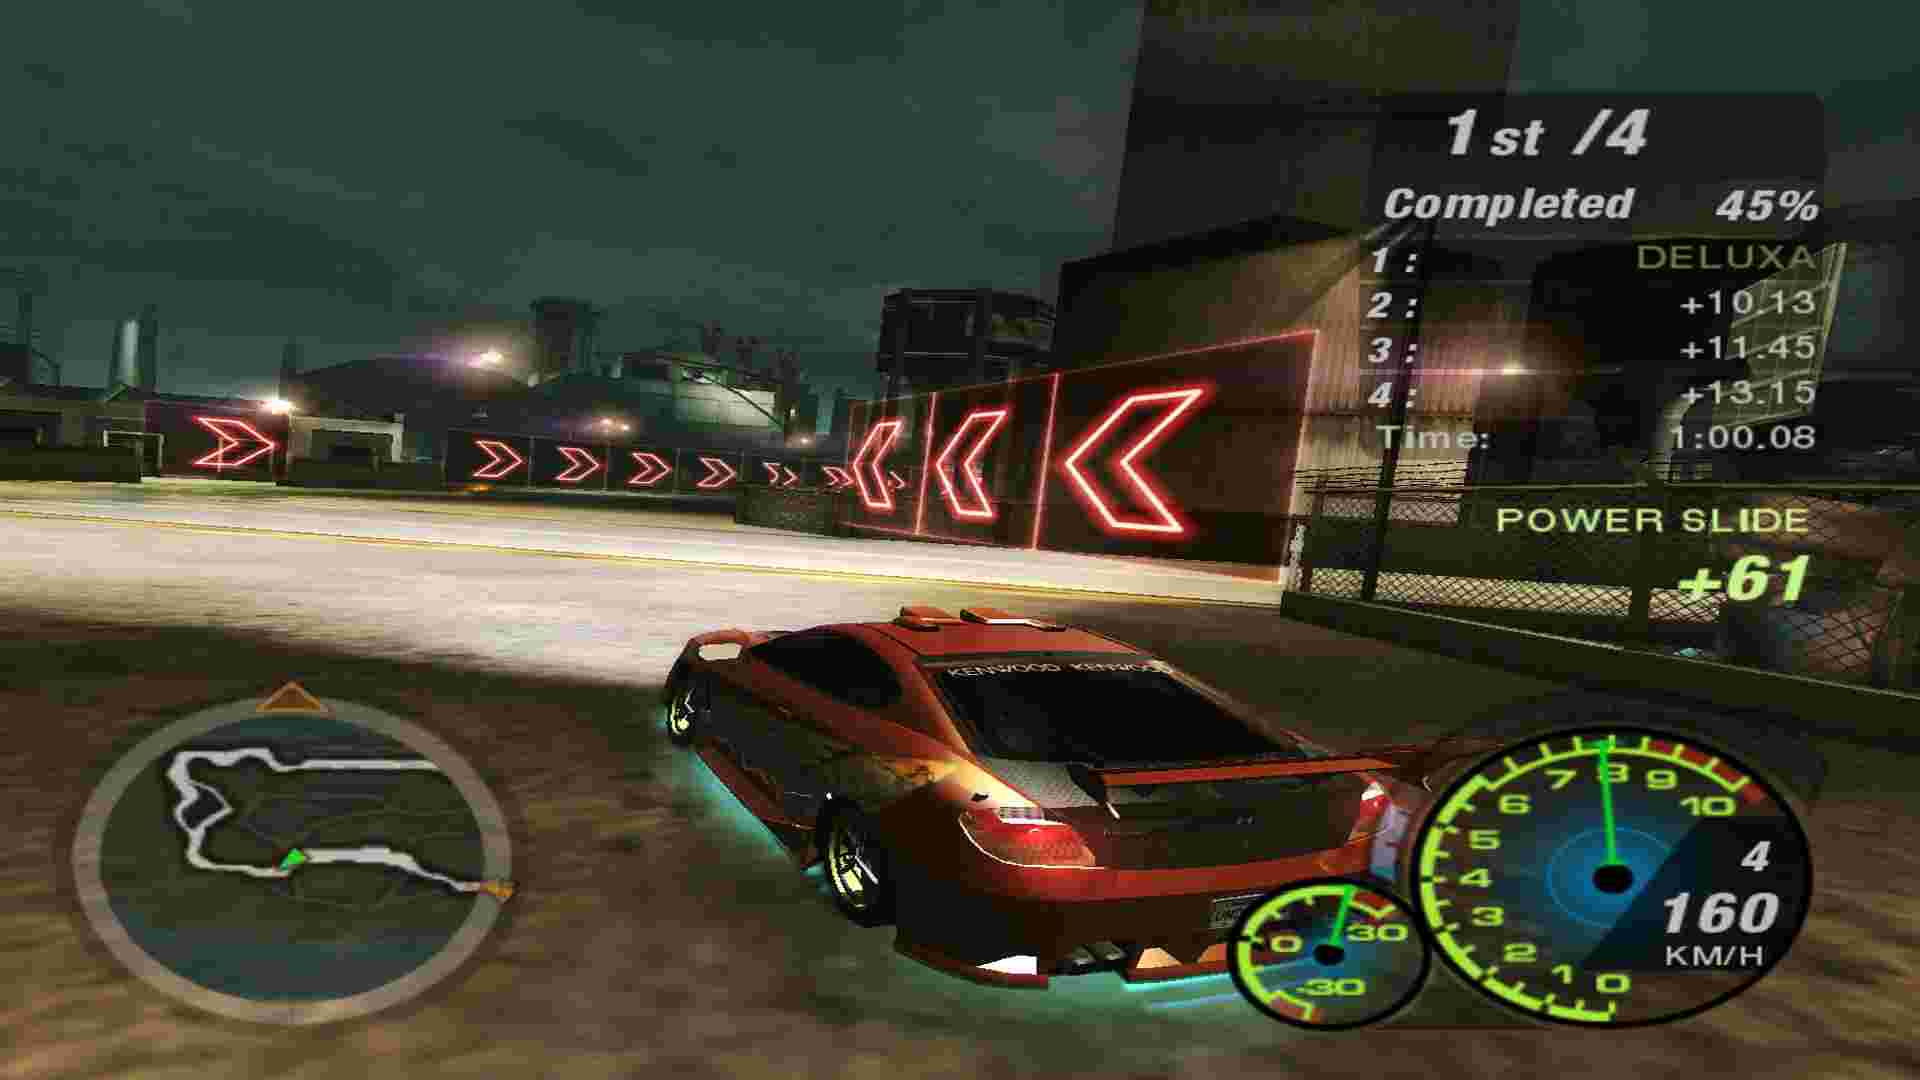 Історія серії Need for Speed. Частина 4 [Underground 1,2]